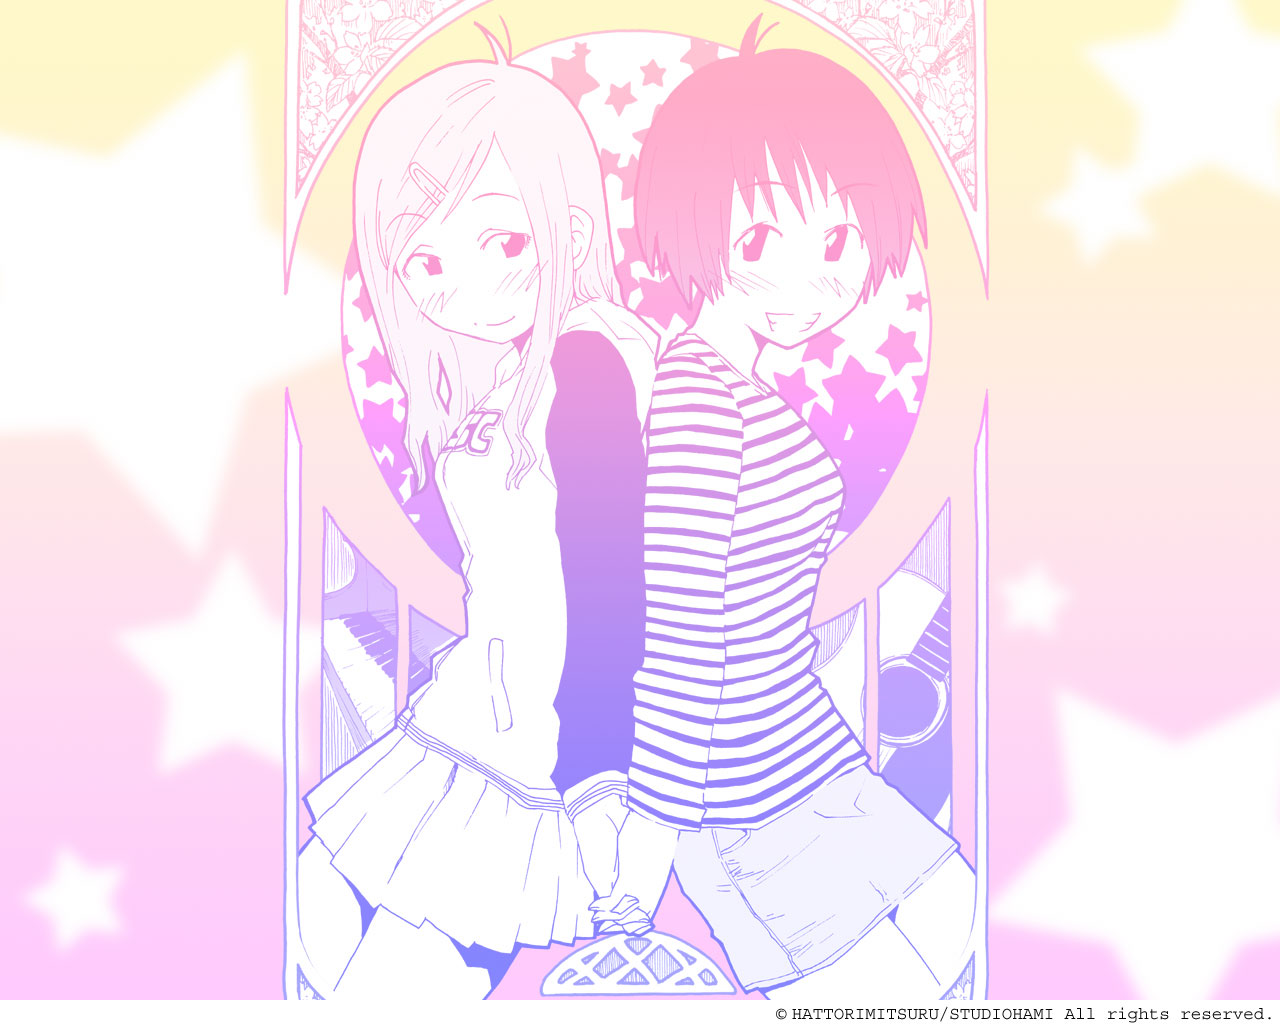 2girls concerto fukagawa_ino hattori_mitsuru monochrome oosawa_hitomi skirt watermark